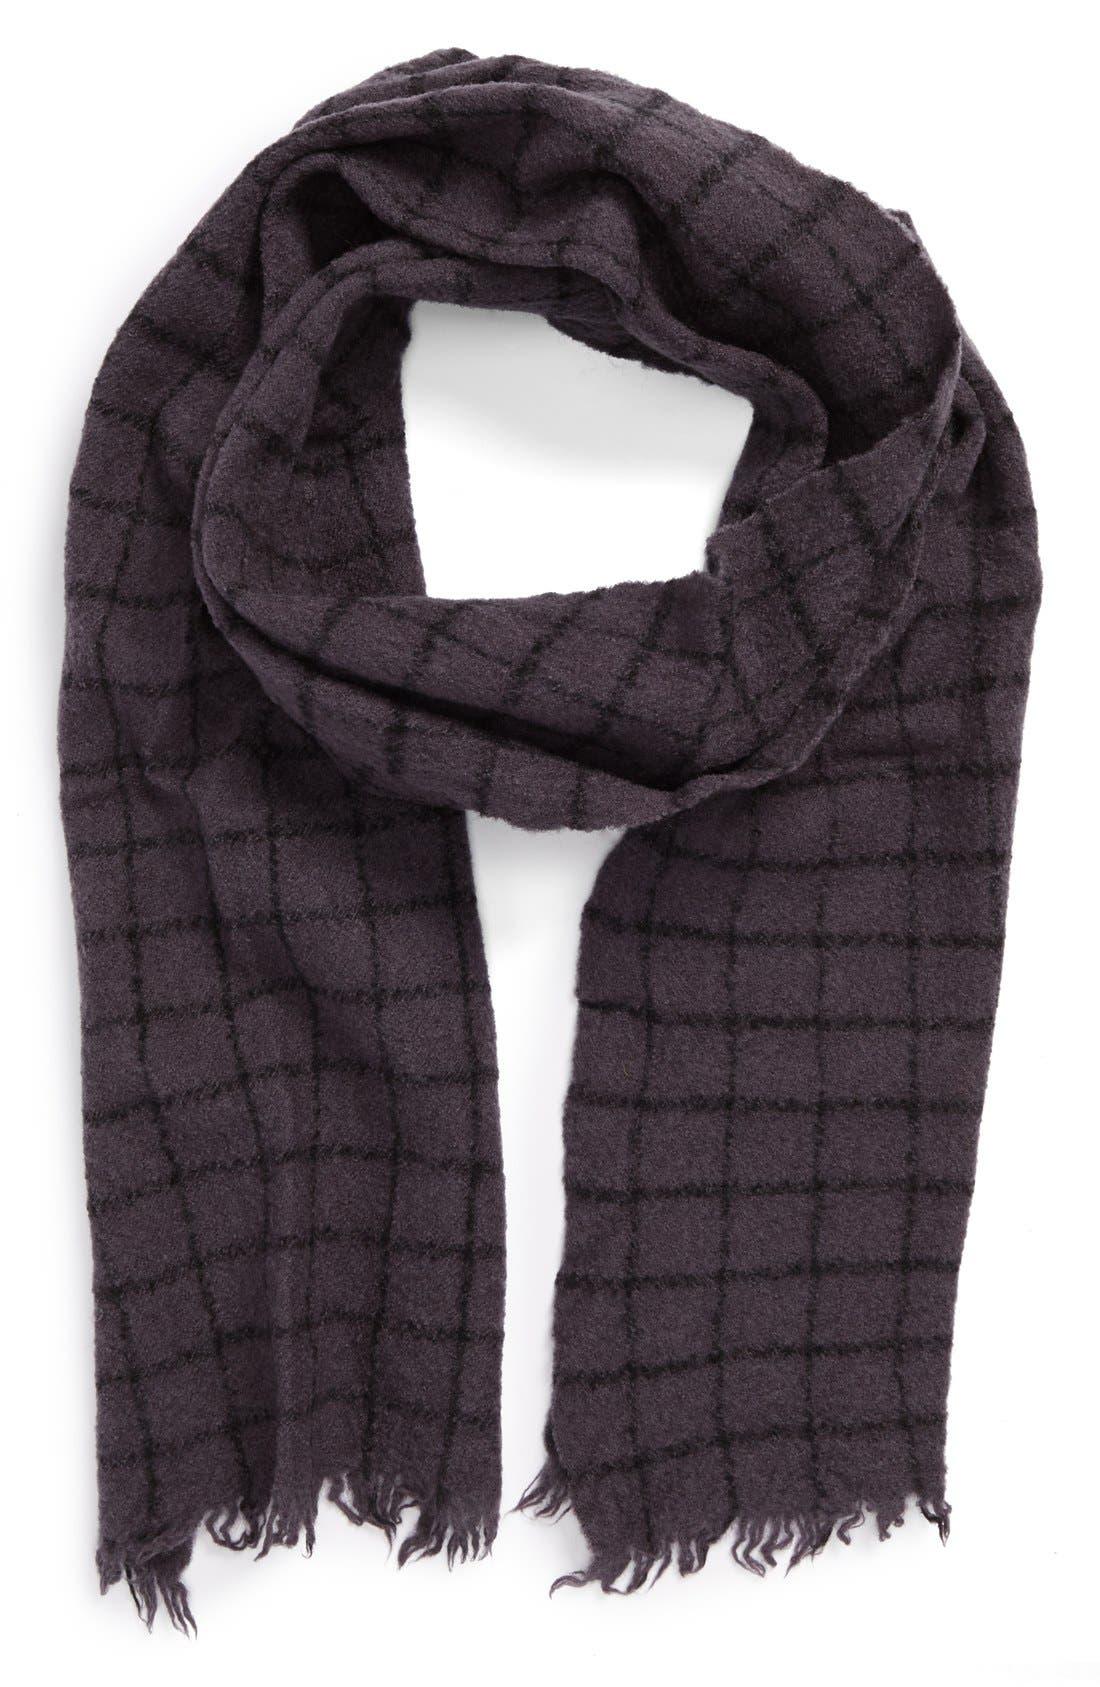 TOPMAN Grid Wool Knit Scarf, Main, color, 021